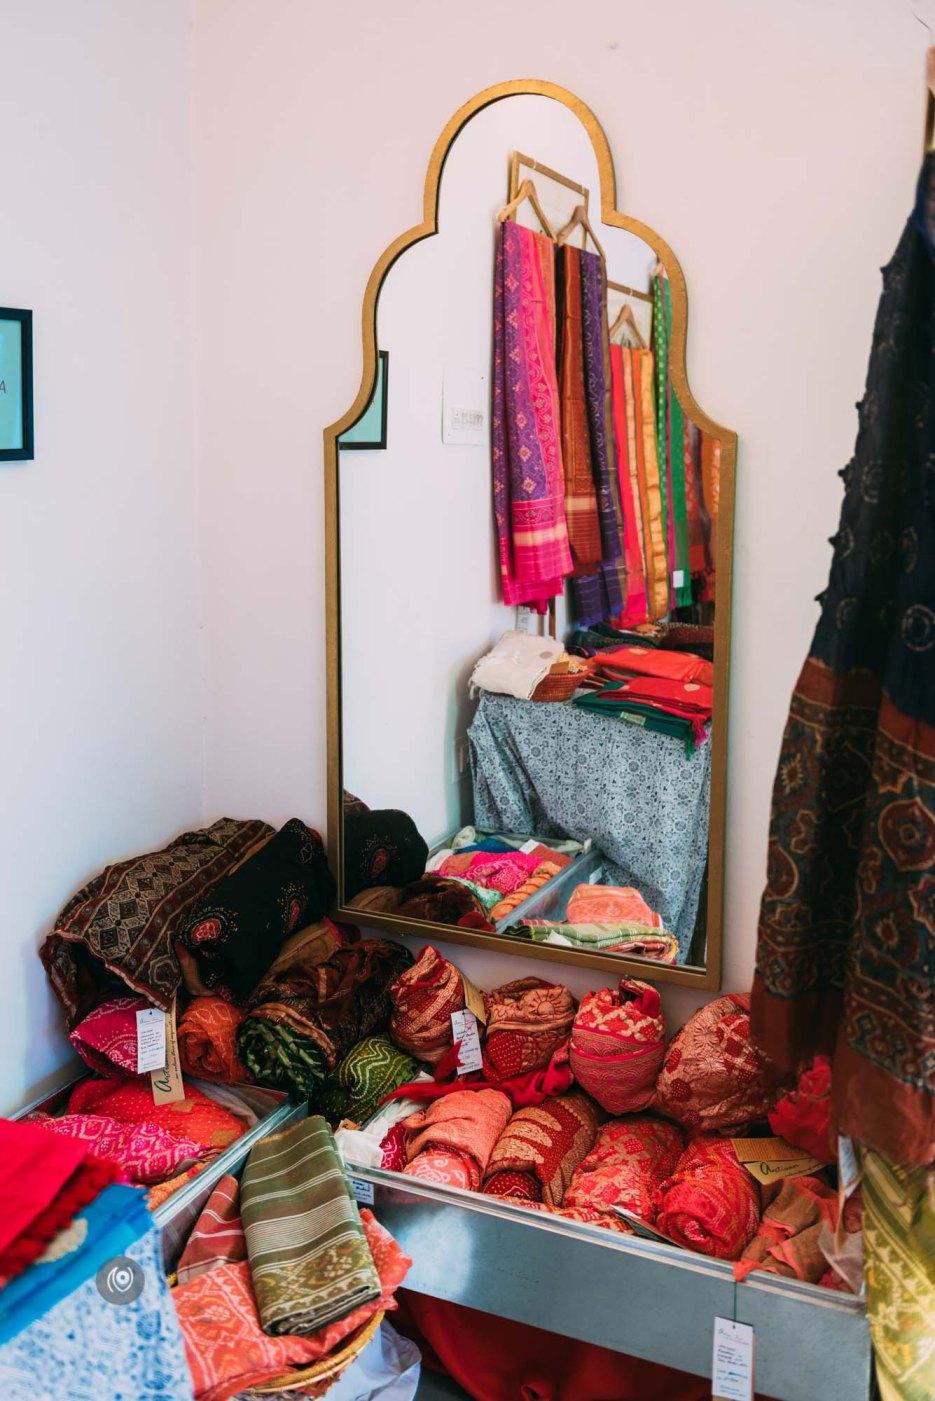 Naina.co, Visual Storyteller, Luxury Brands, Naina Redhu, Professional Photographer, Experience Collector, Luxury Photographer, Luxury Blogger, Lifestyle, Visual Storyteller for Luxury Brands, EyesForLuxury, Luxury Blogger, Lifestyle Blogger, Luxury Photographer India, Lifestyle Photographer India, Luxury Blogger India, Lifestyle Blogger India, Serendipity Delhi, Haveli, Color Me Autumn, #ColorMeAutumn, Festival, Annual Festival, Shopping, Music, Fashion, Jewellery, #MadeInIndia, Made In India, Digital Journey Talk, Speakers, Jaunapur, Jonapur, Chattarpur, New Delhi, #EyesForDelhi